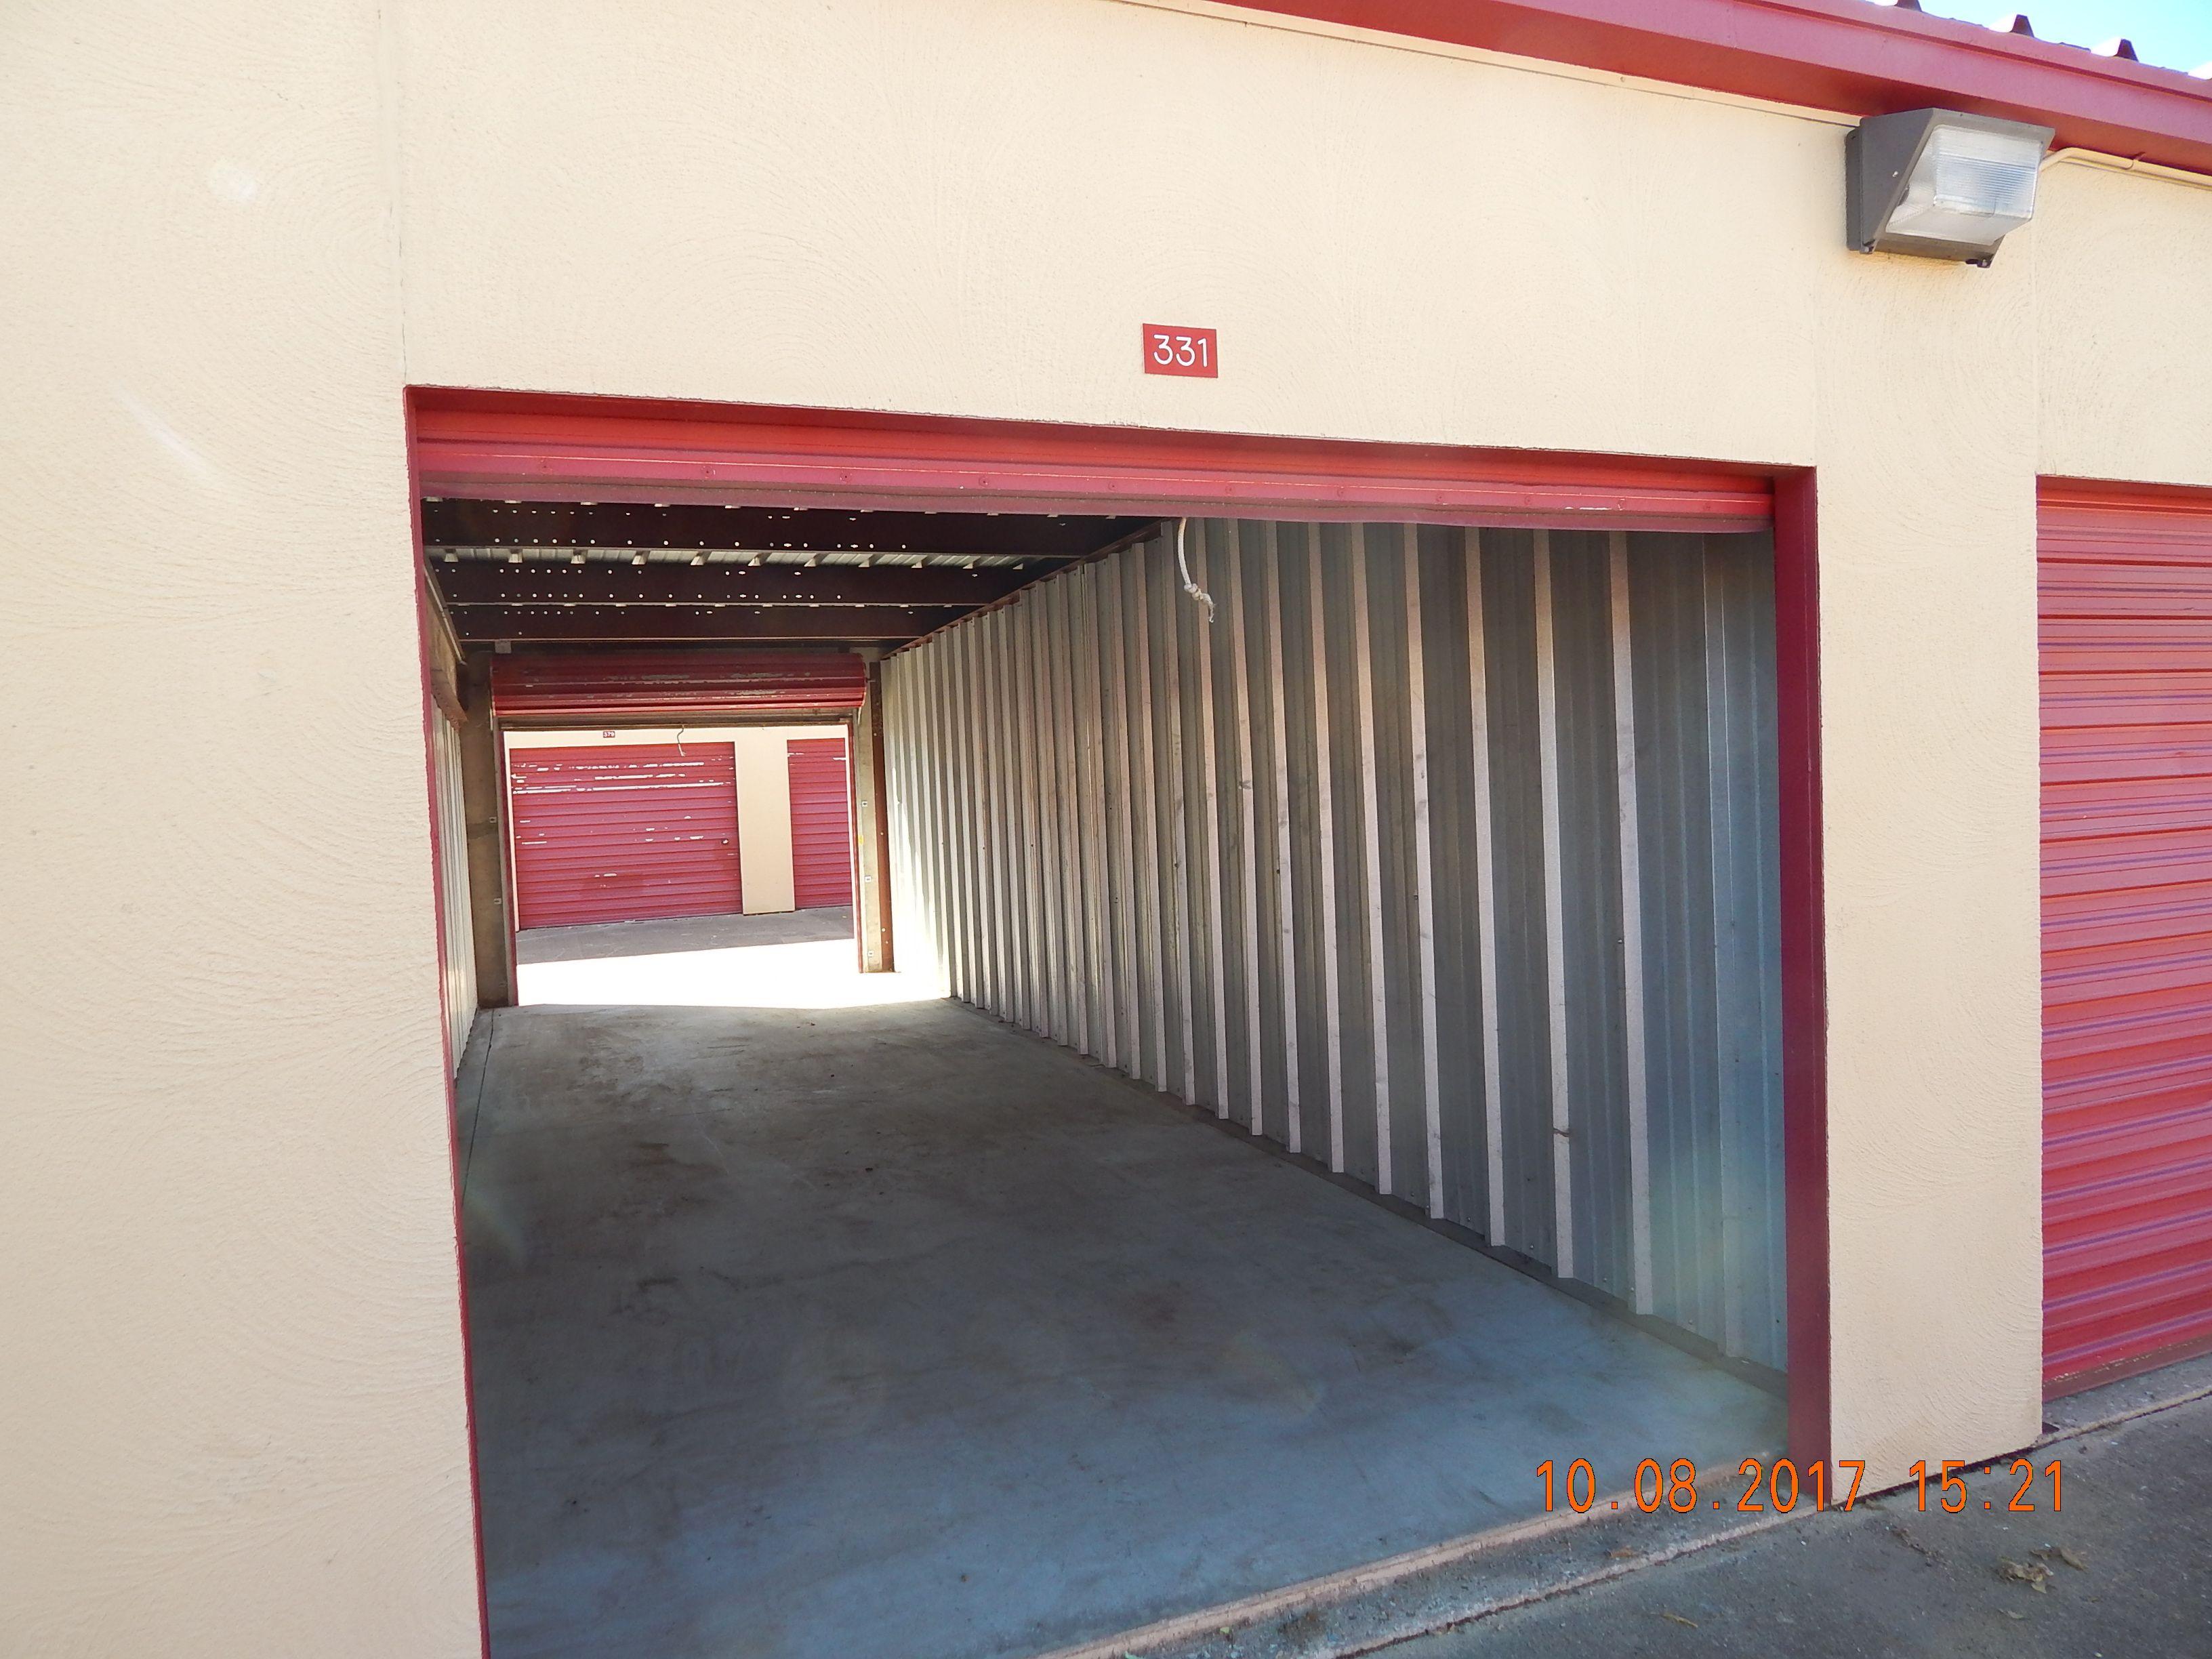 Pin By Sharonandmark Mccready On Adventures In Storage Unit Auctions 2017 Storage Unit Auctions Outdoor Decor Decor